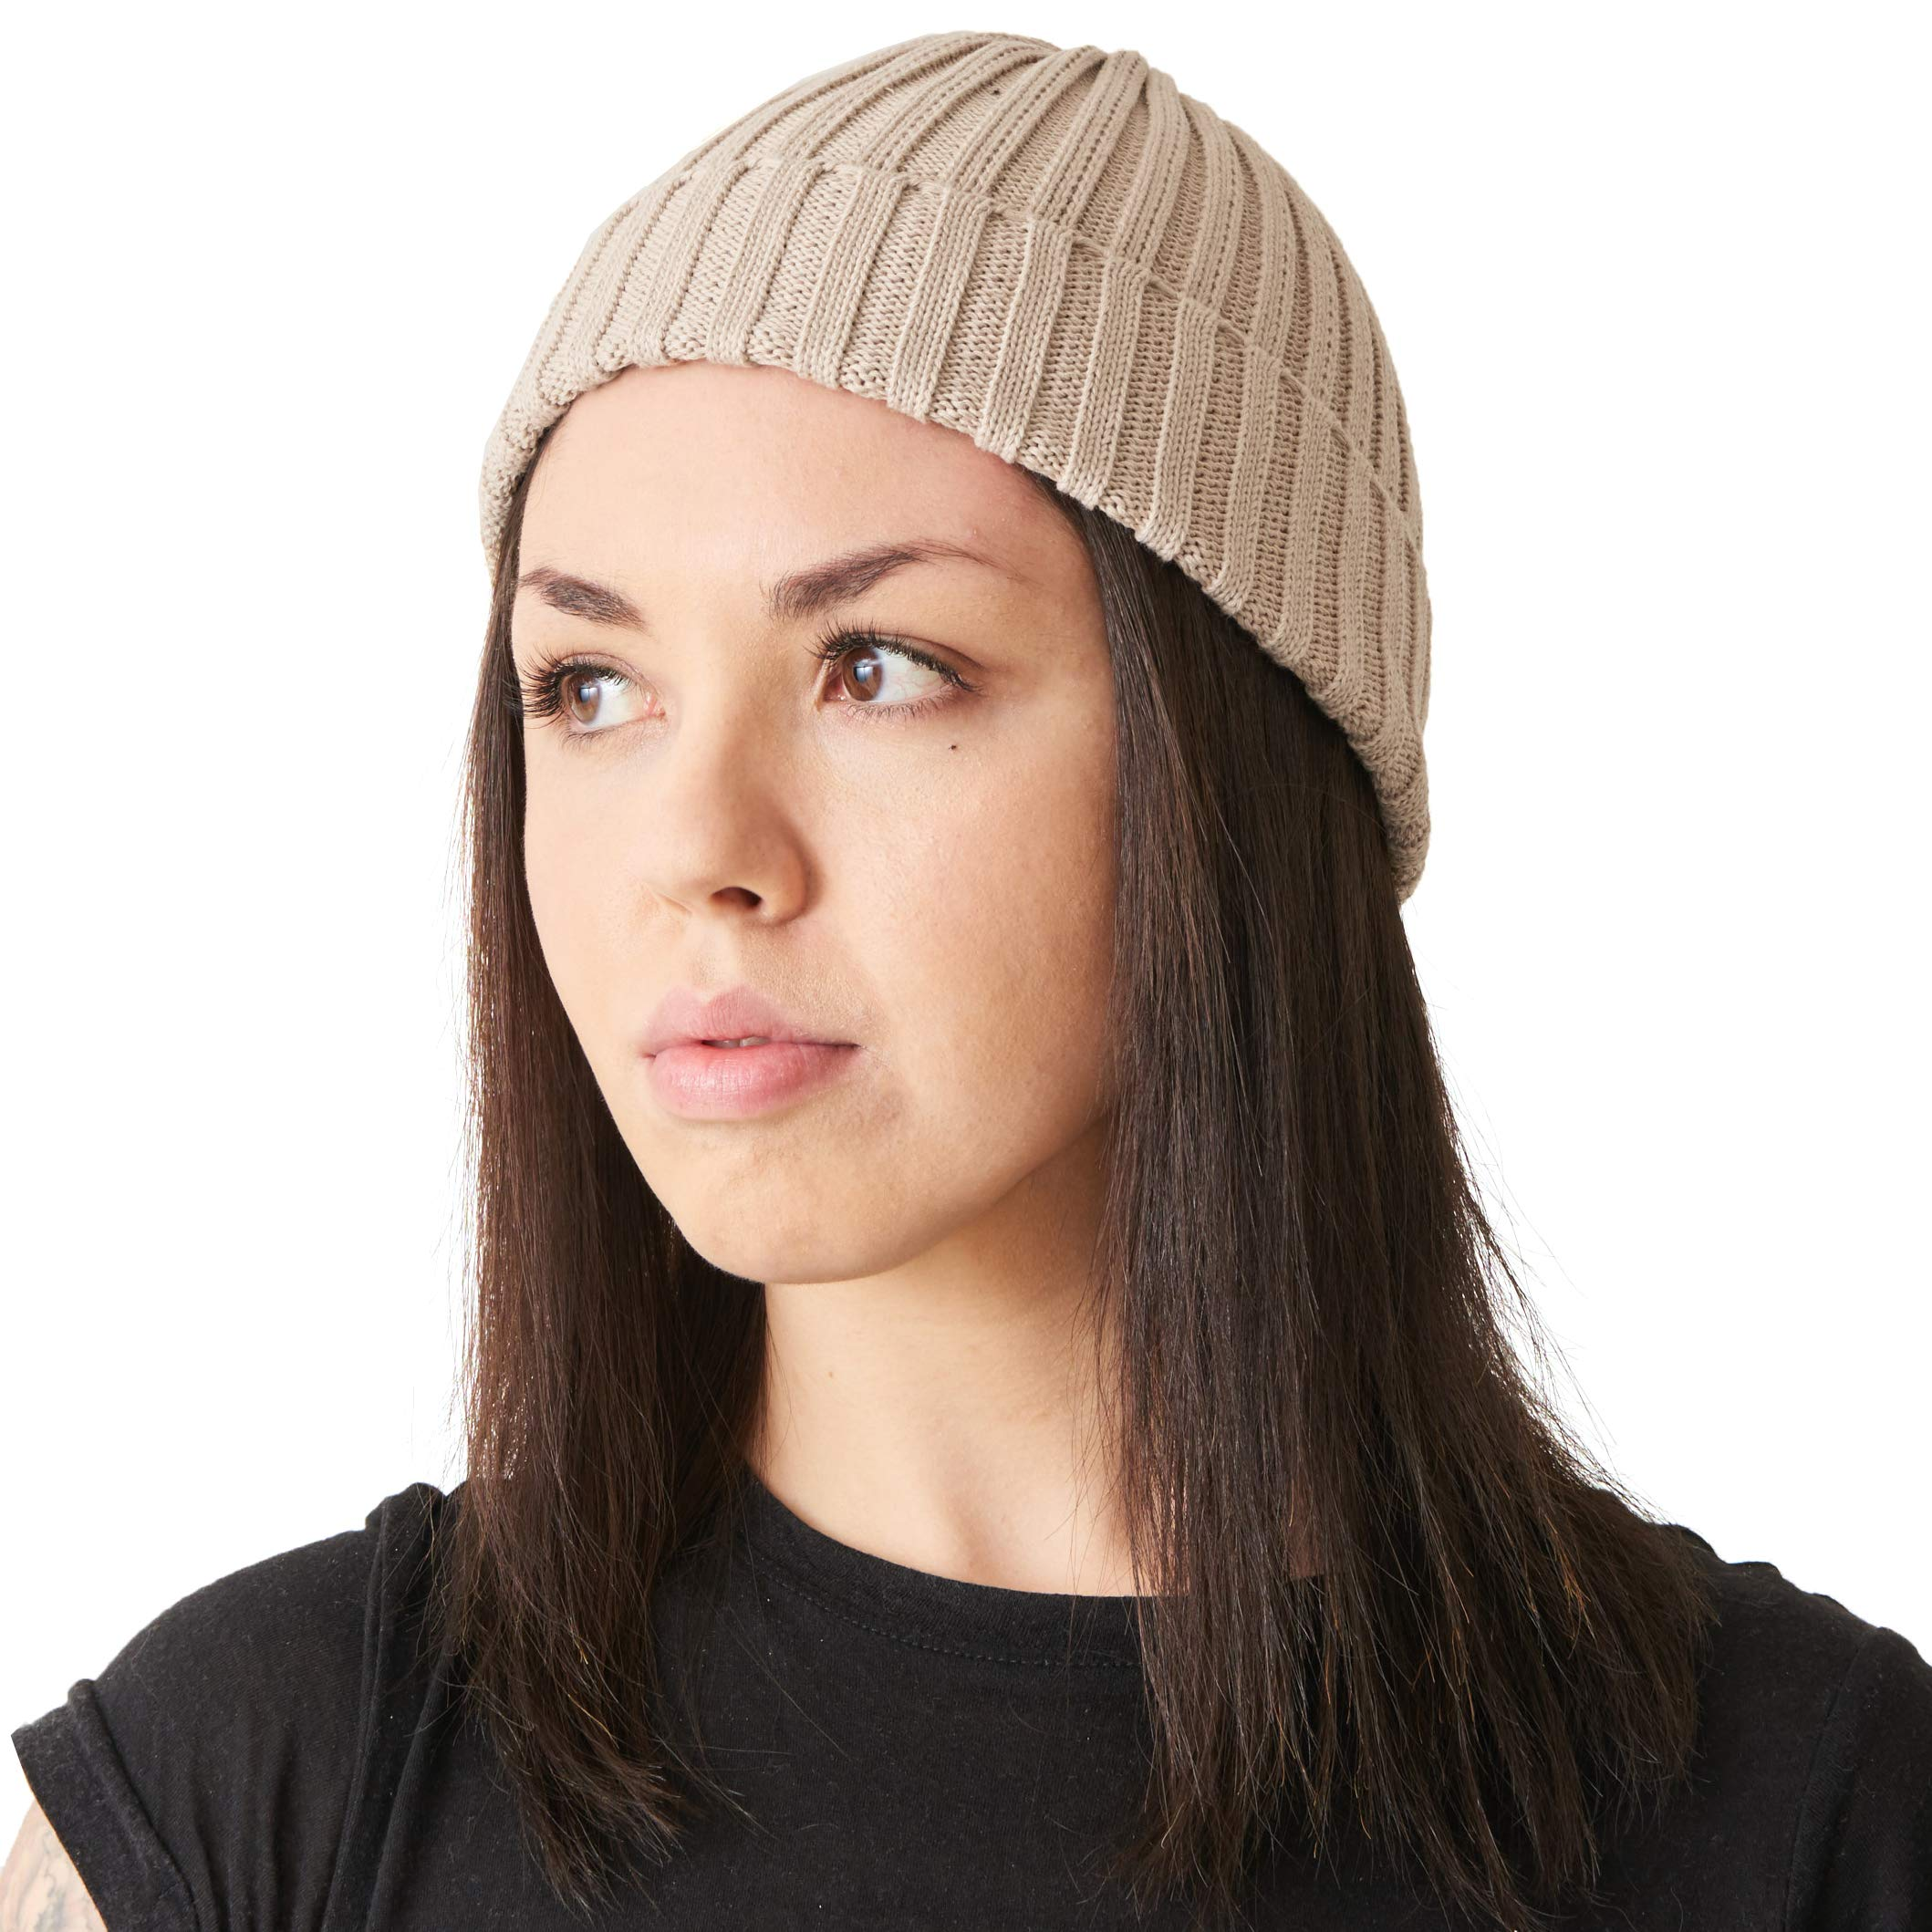 e6b9b762 CHARM Mens Fisherman's Beanie Hat - Cotton Slouch Cap Women Chemo ...